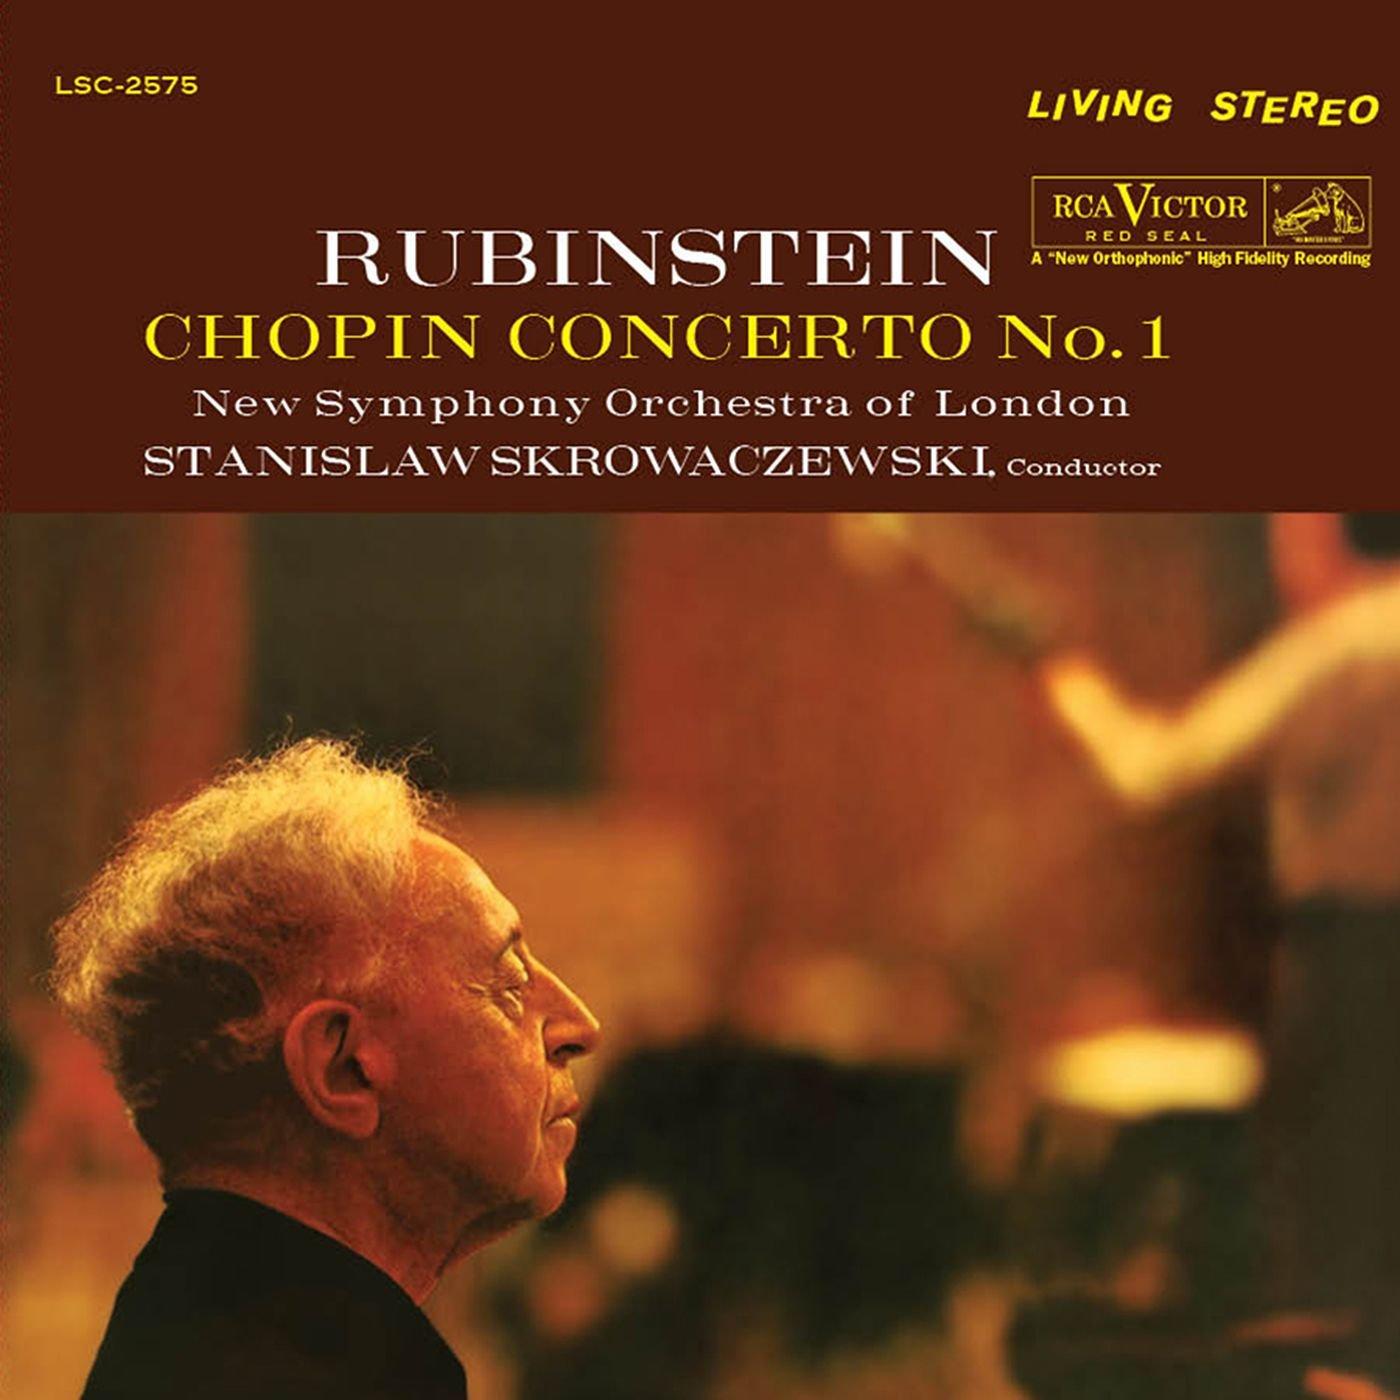 Vinilo : Stanislaw Skrowaczewski - Chopin: Concerto No. 1 (200 Gram Vinyl)